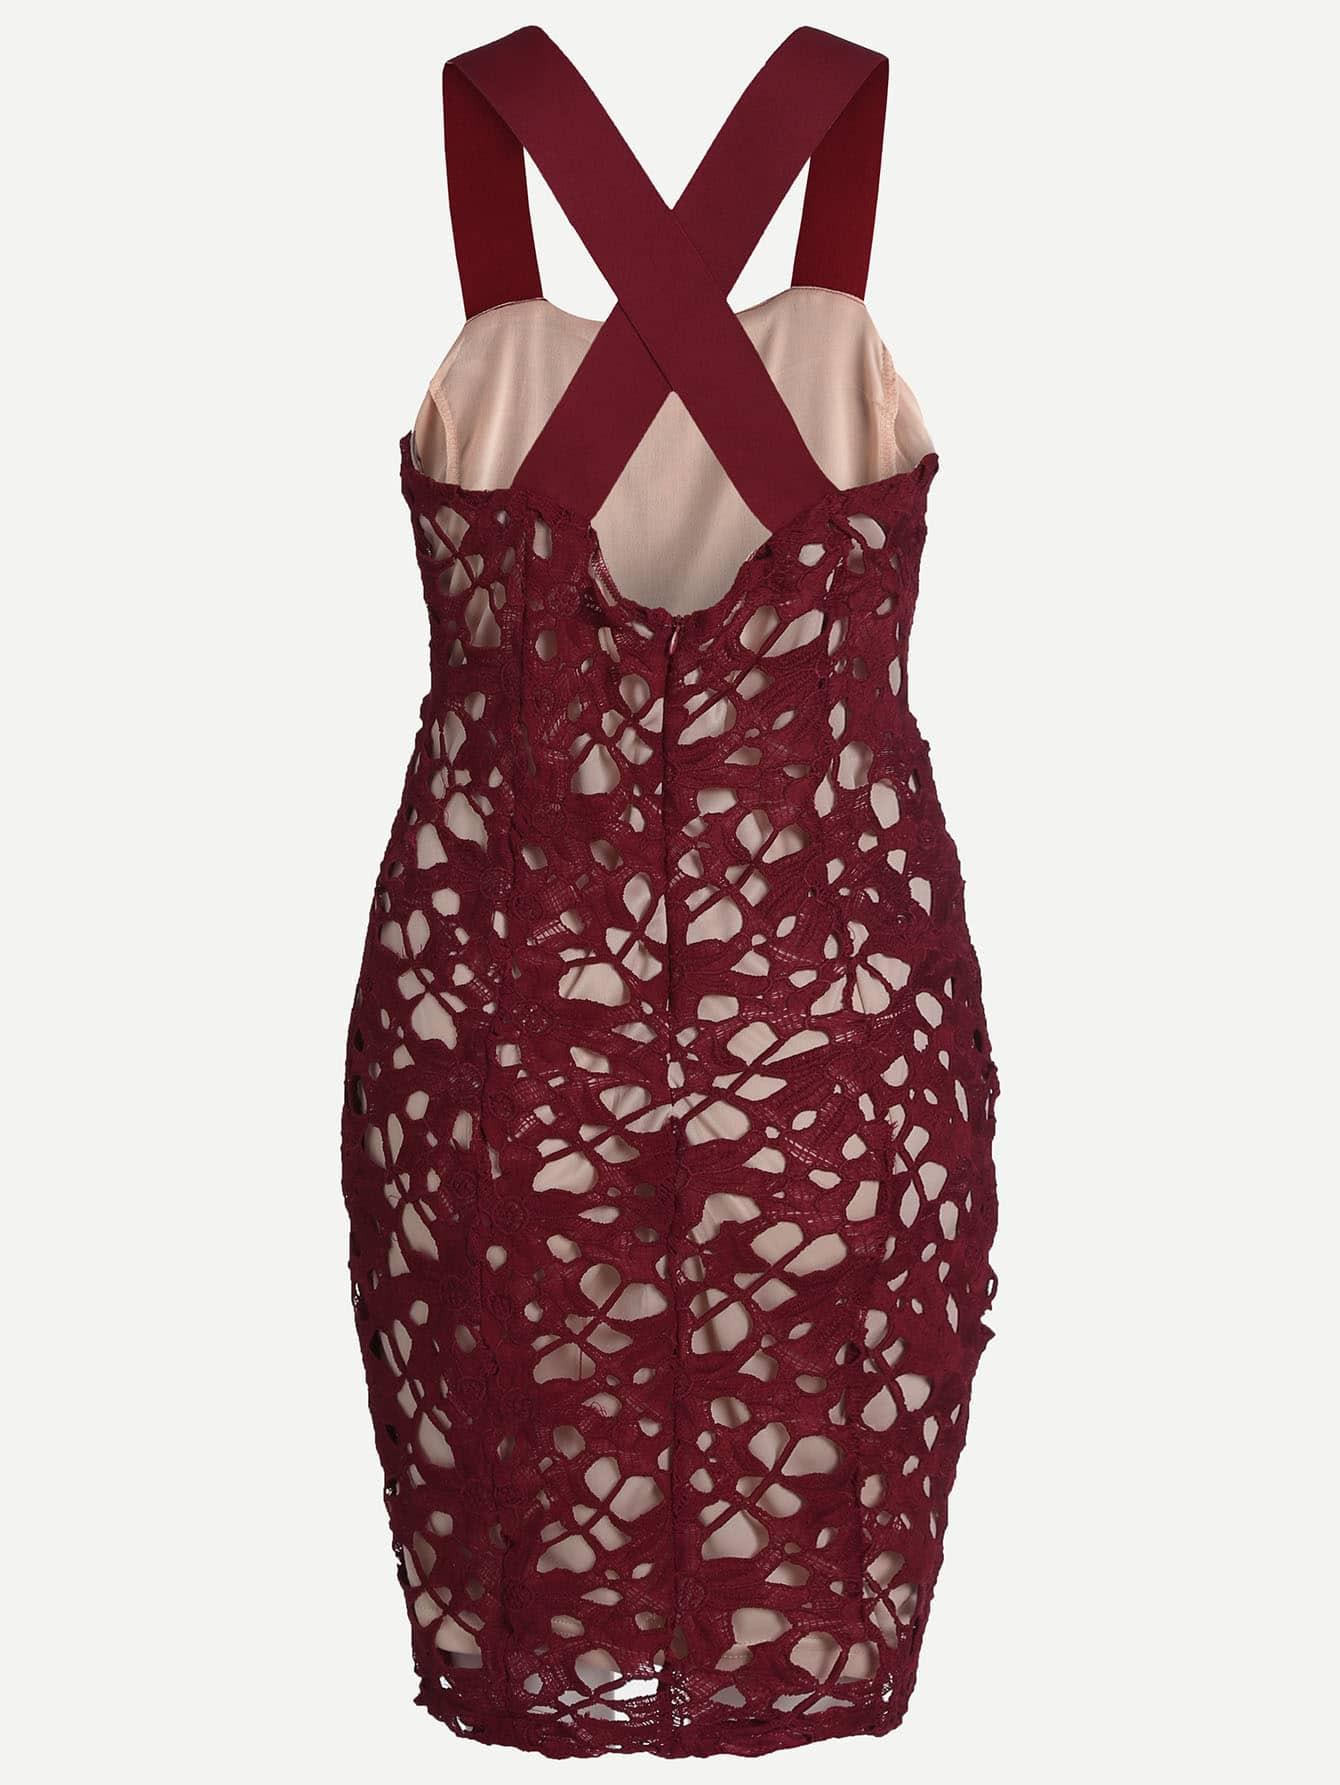 robe soir e avec ruban et dos nu bordeaux rouge french shein sheinside. Black Bedroom Furniture Sets. Home Design Ideas